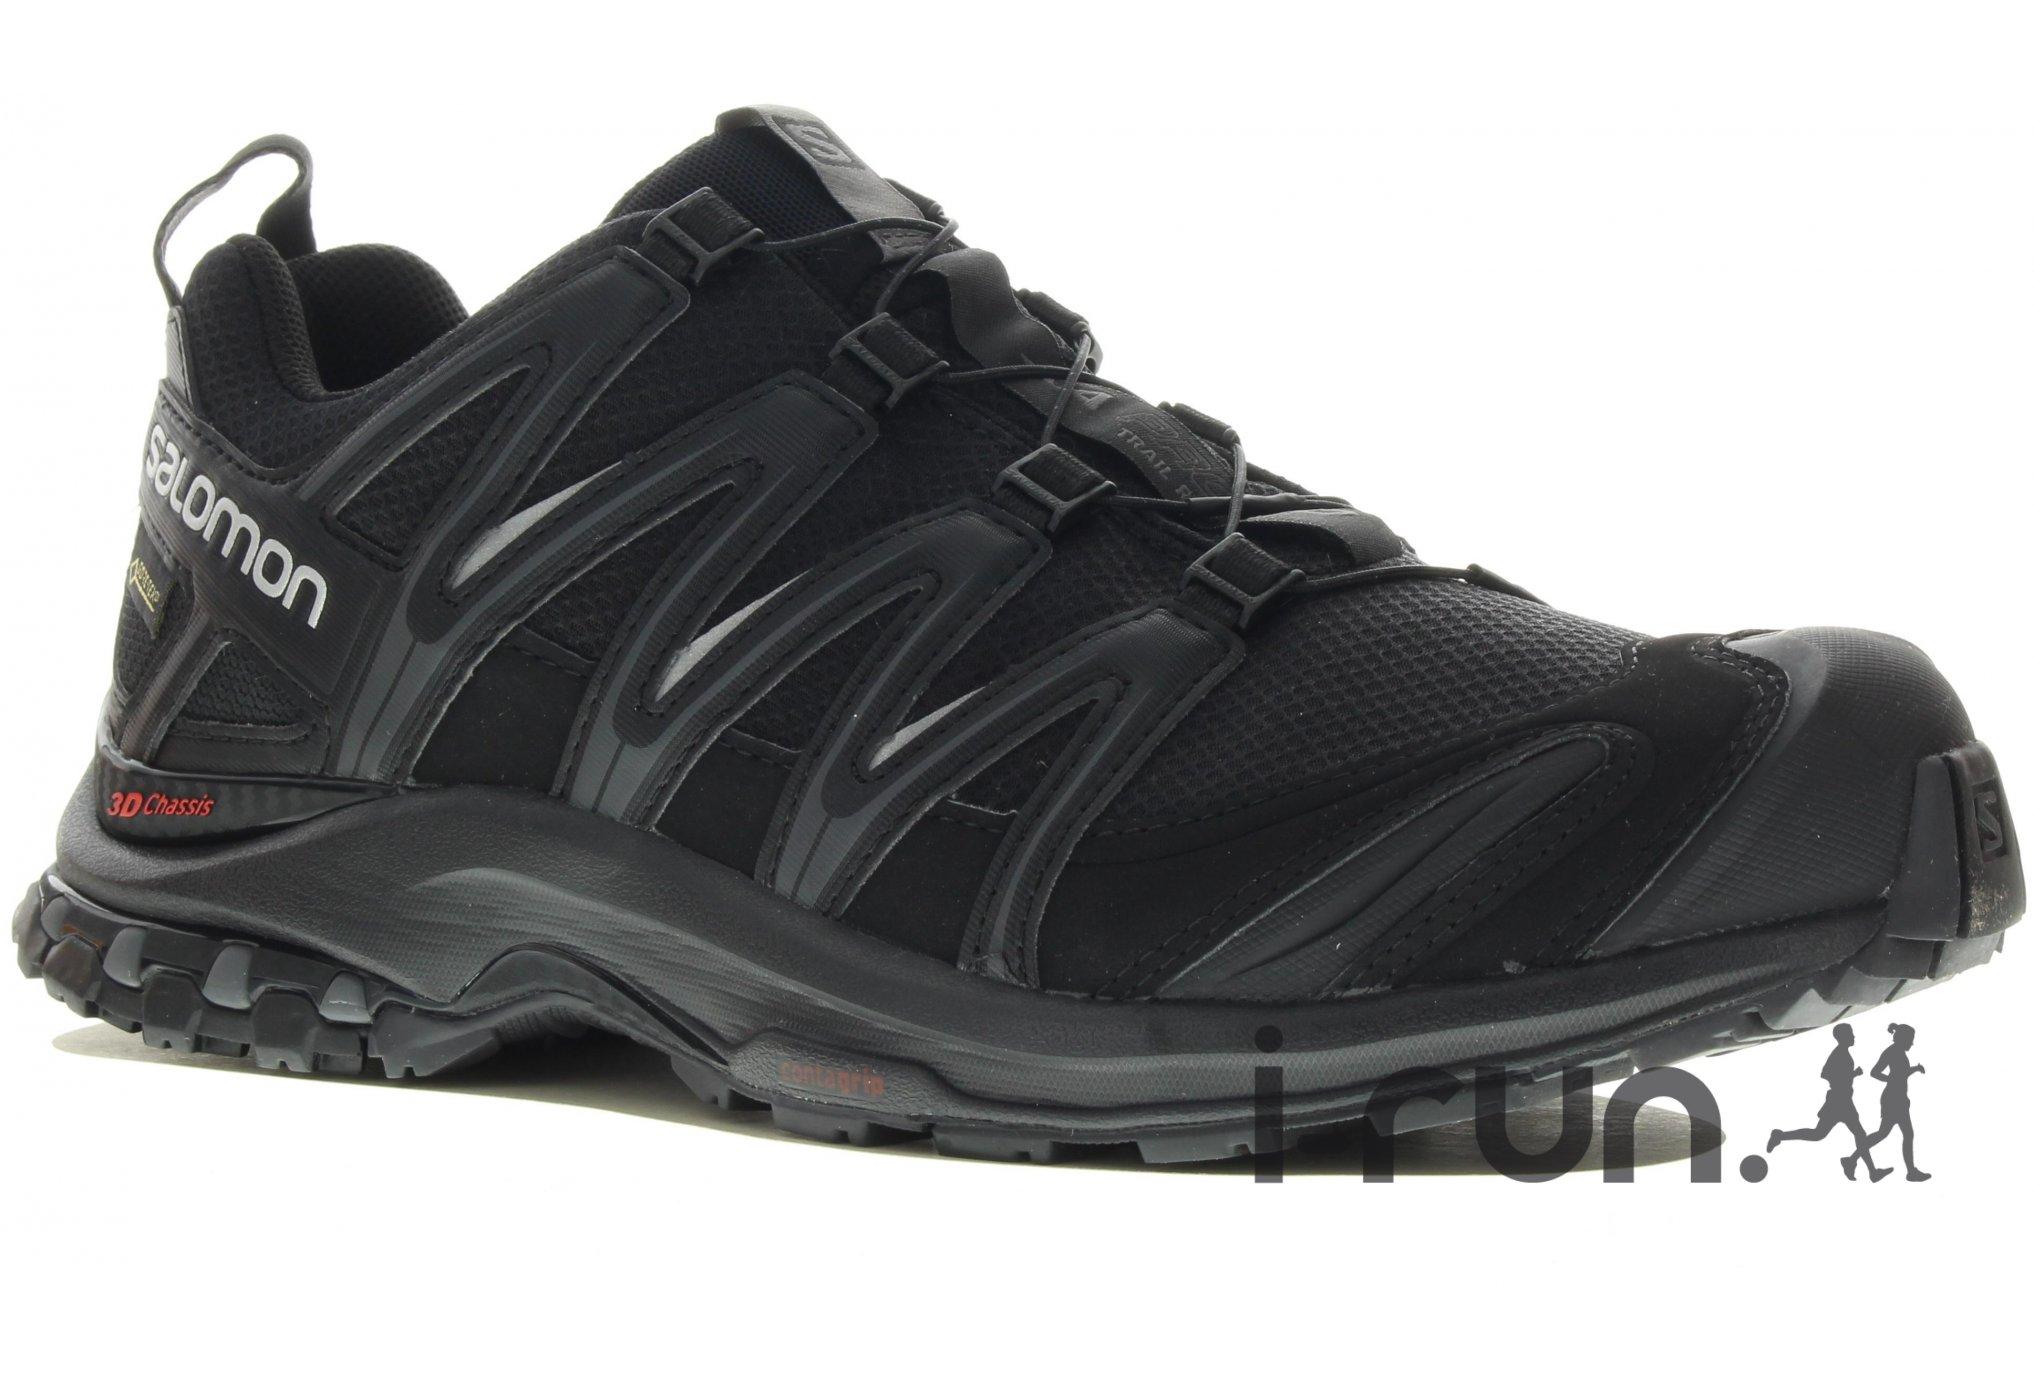 Salomon M homme XA running Salomon 3D Gore XA Tex Chaussures PRO dhtsQr